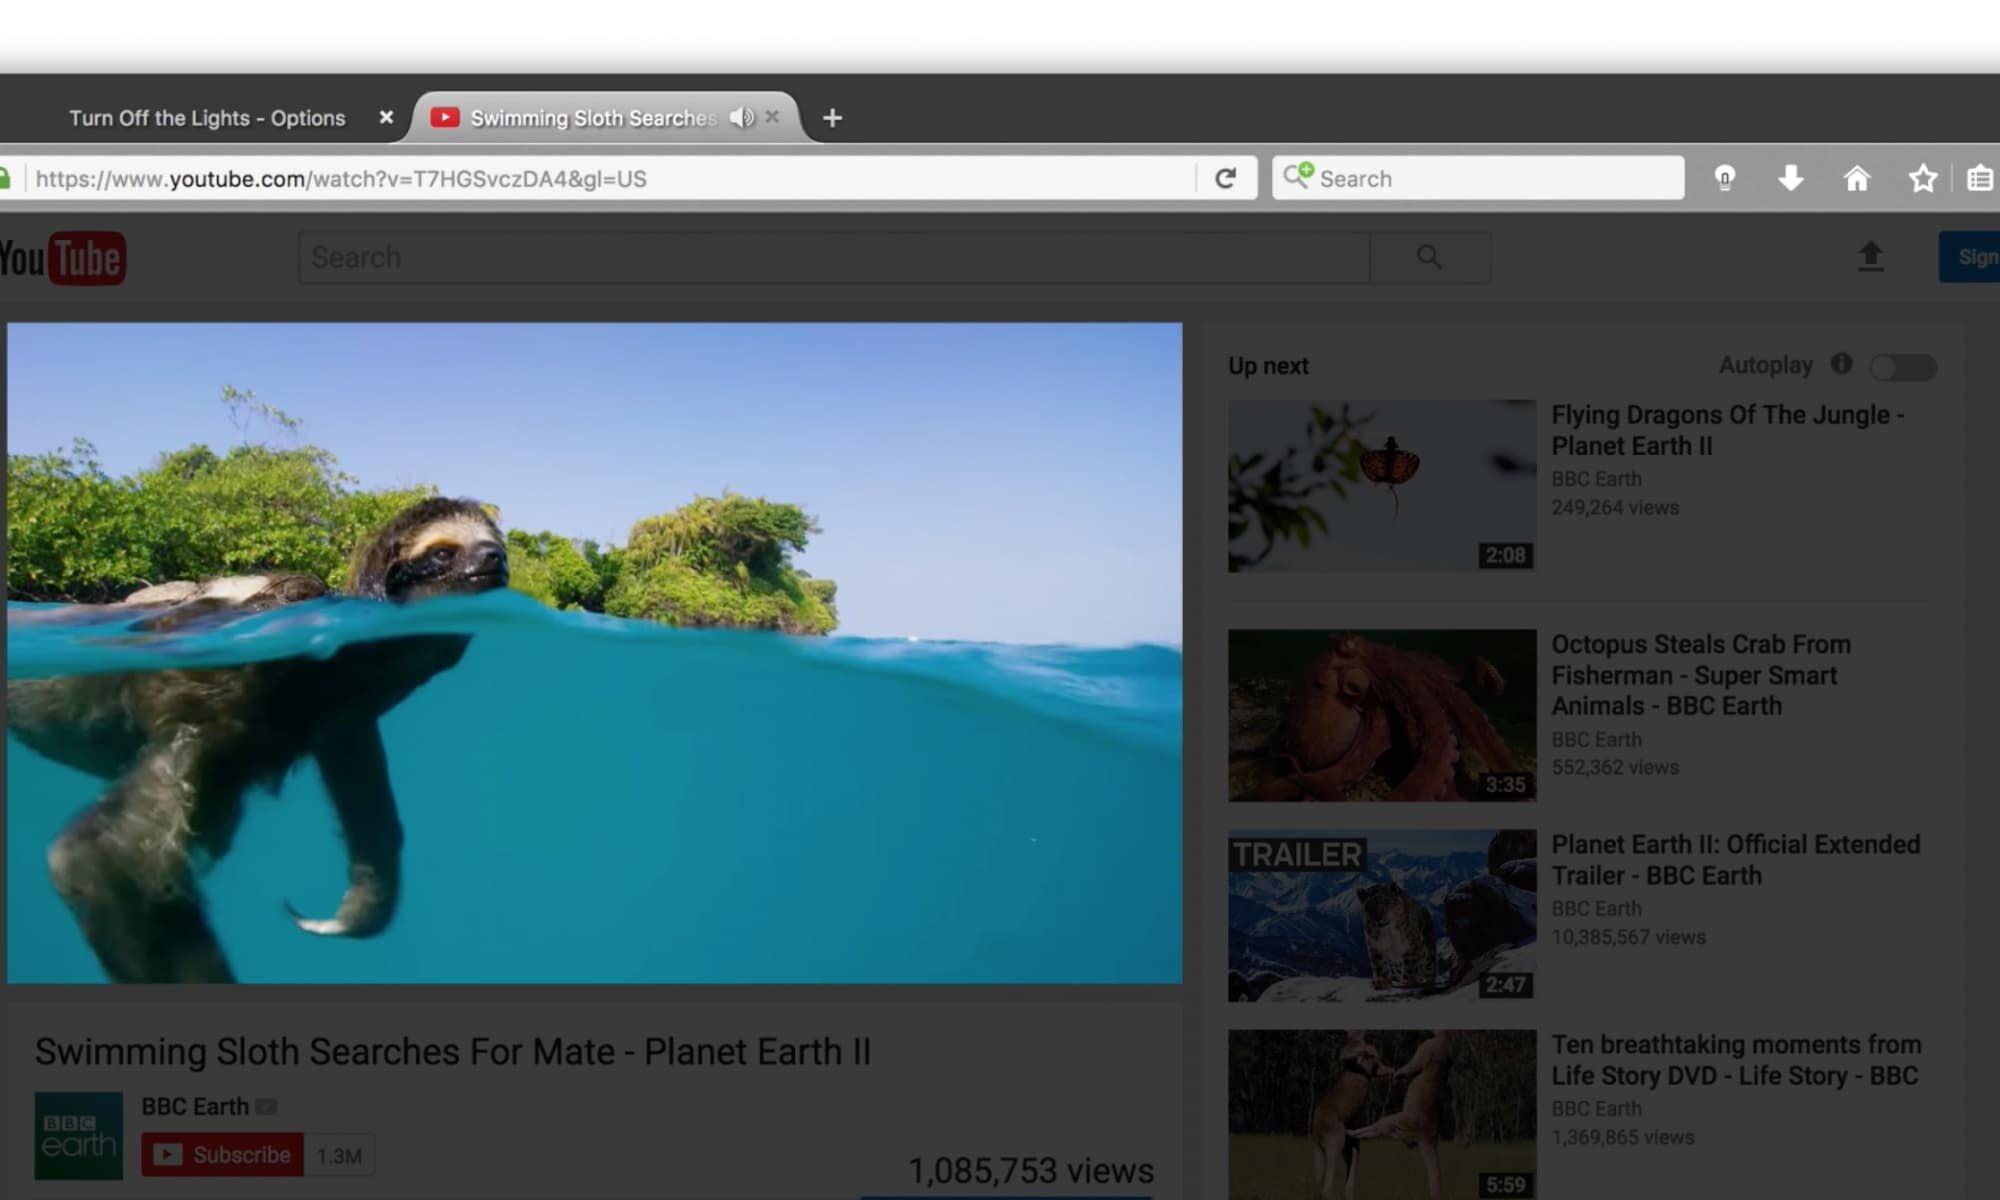 Sneak peak of the Firefox dark theme